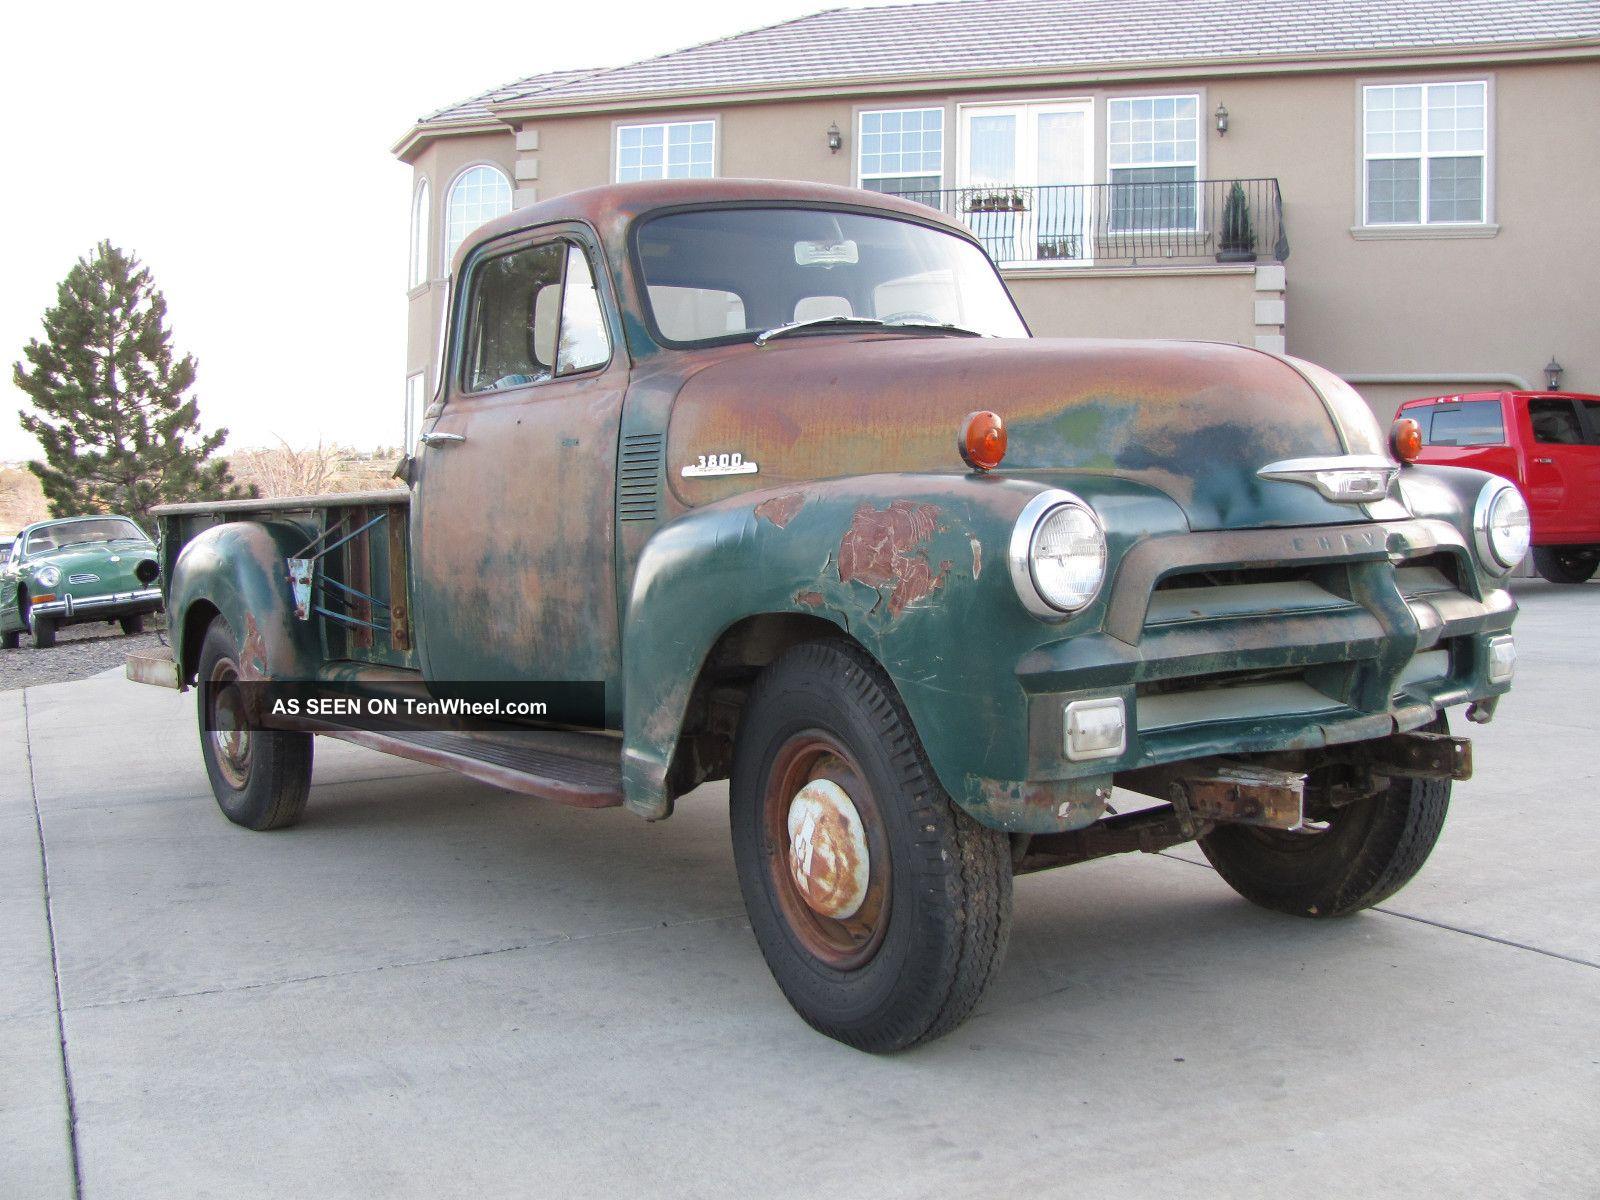 1954 Chevrolet 3800 5 Window Pickup Truck Barn Find Cond Rat Rod Pick Up